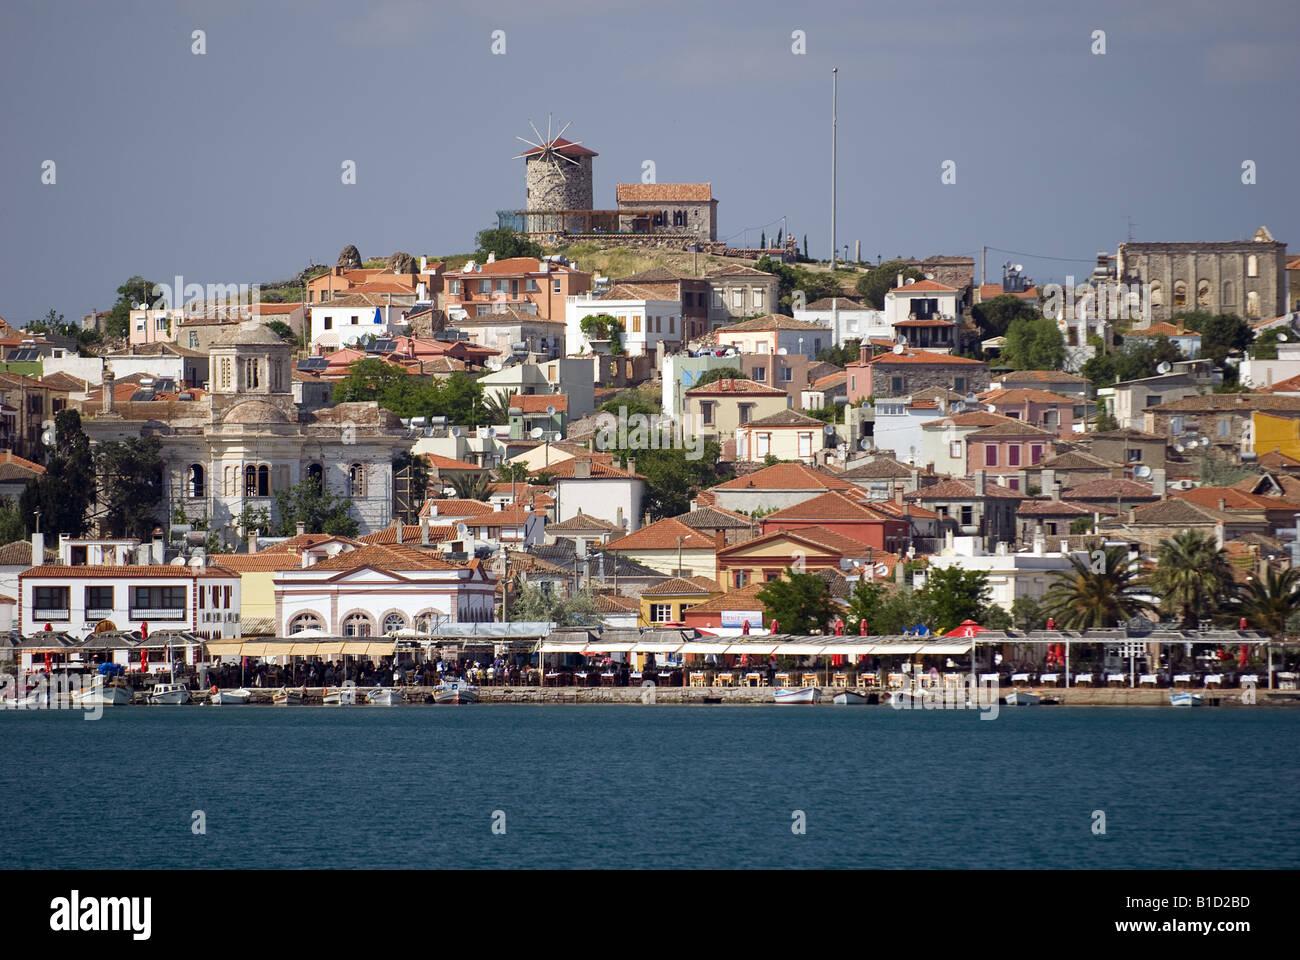 Scenic view of Cunda Alibey Island and waterfront restaurants Ayvalik Turkey - Stock Image